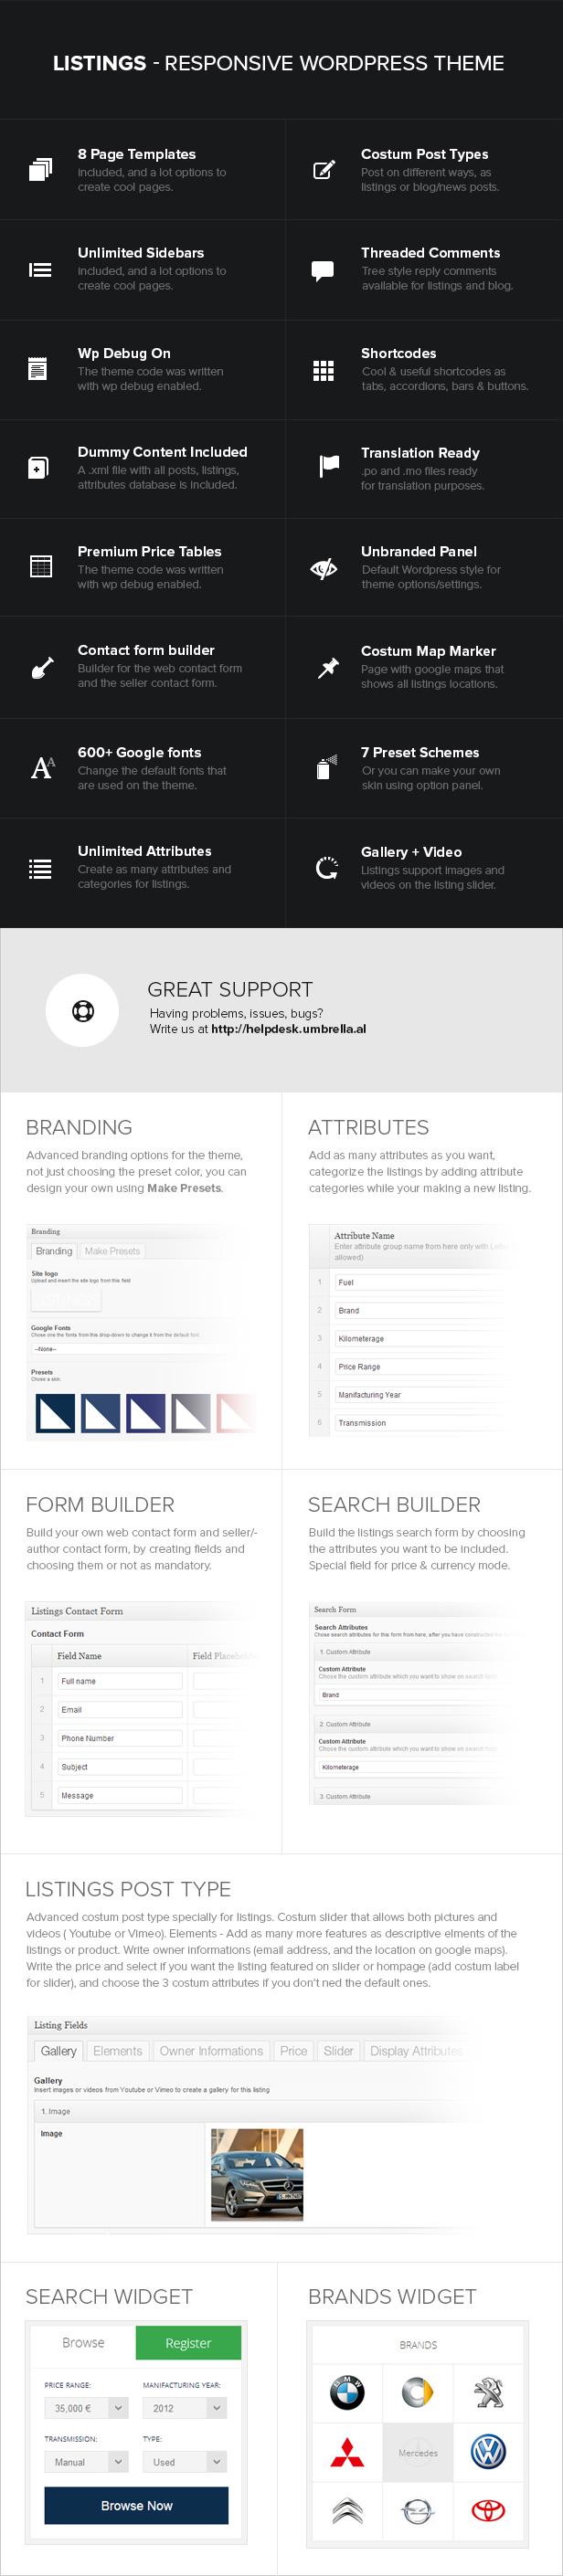 Listings - WordPress Responsive Listings Theme - 4